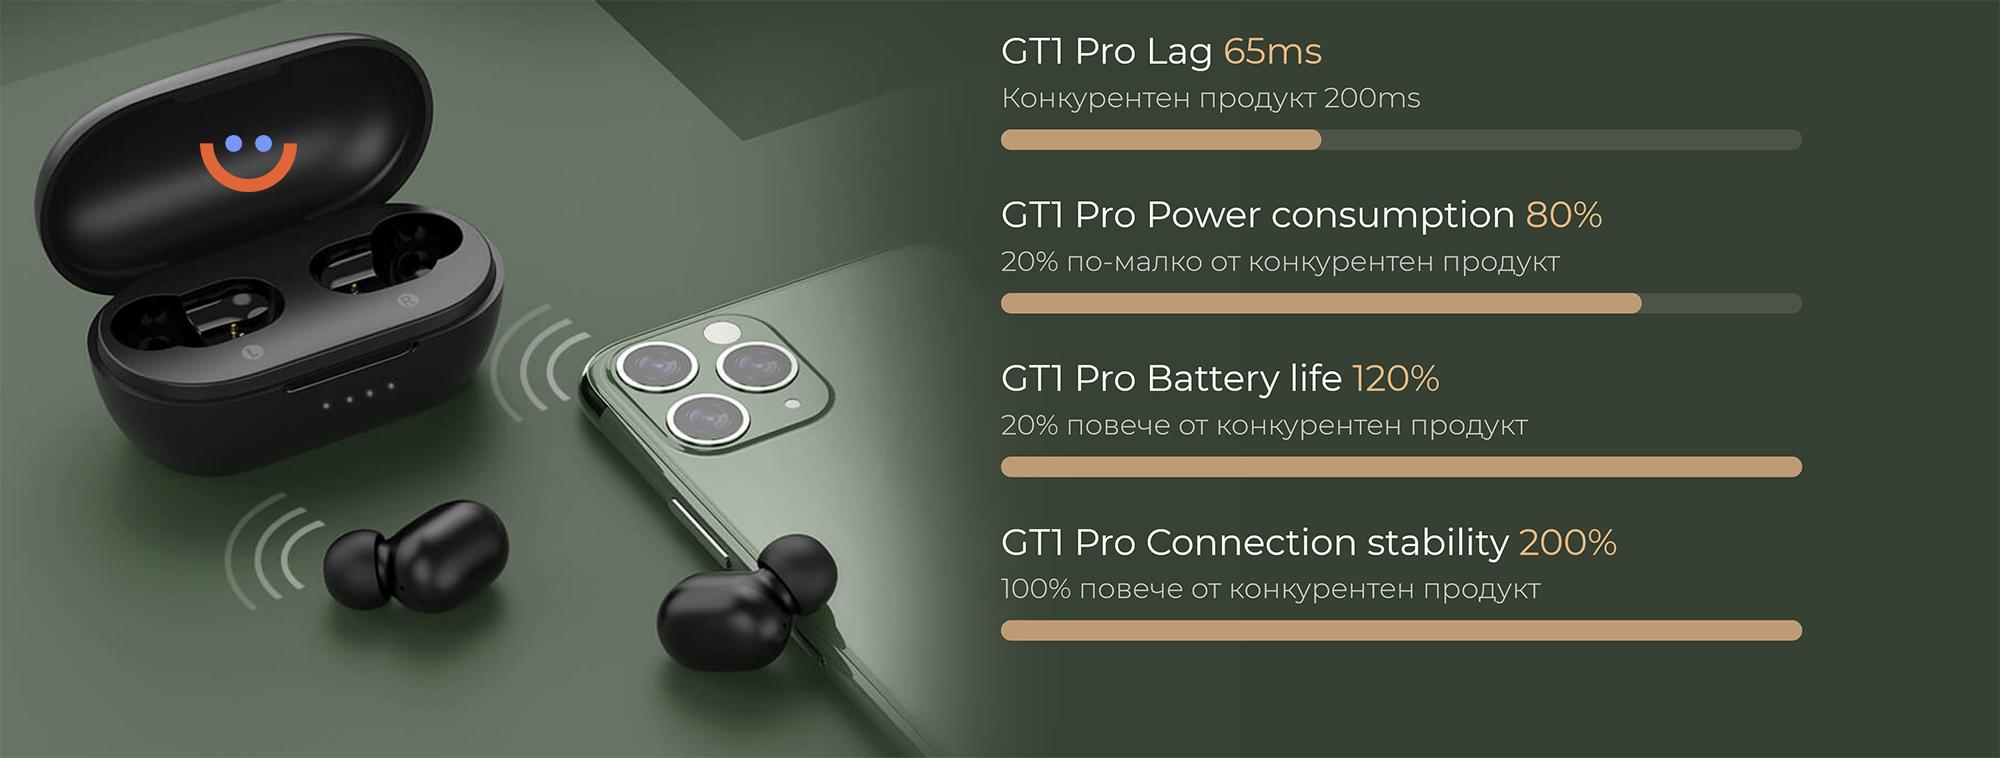 слушалки Xiaomi Haylou GT1 Pro